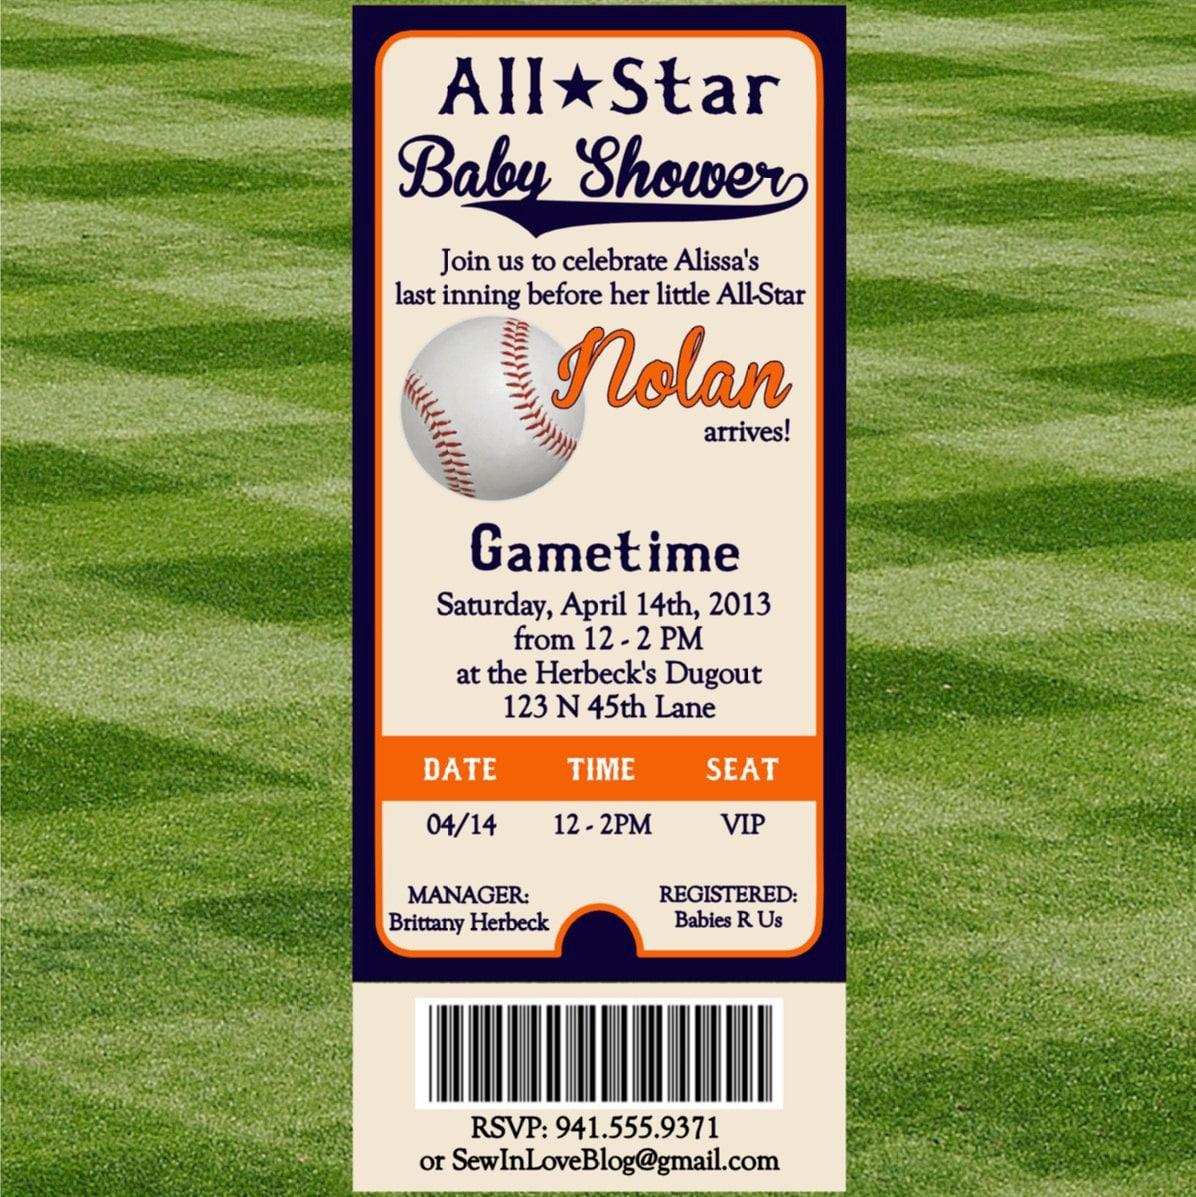 Baseball Baby Shower Invi On Baby Shower Invitations Baseball Simpl ...